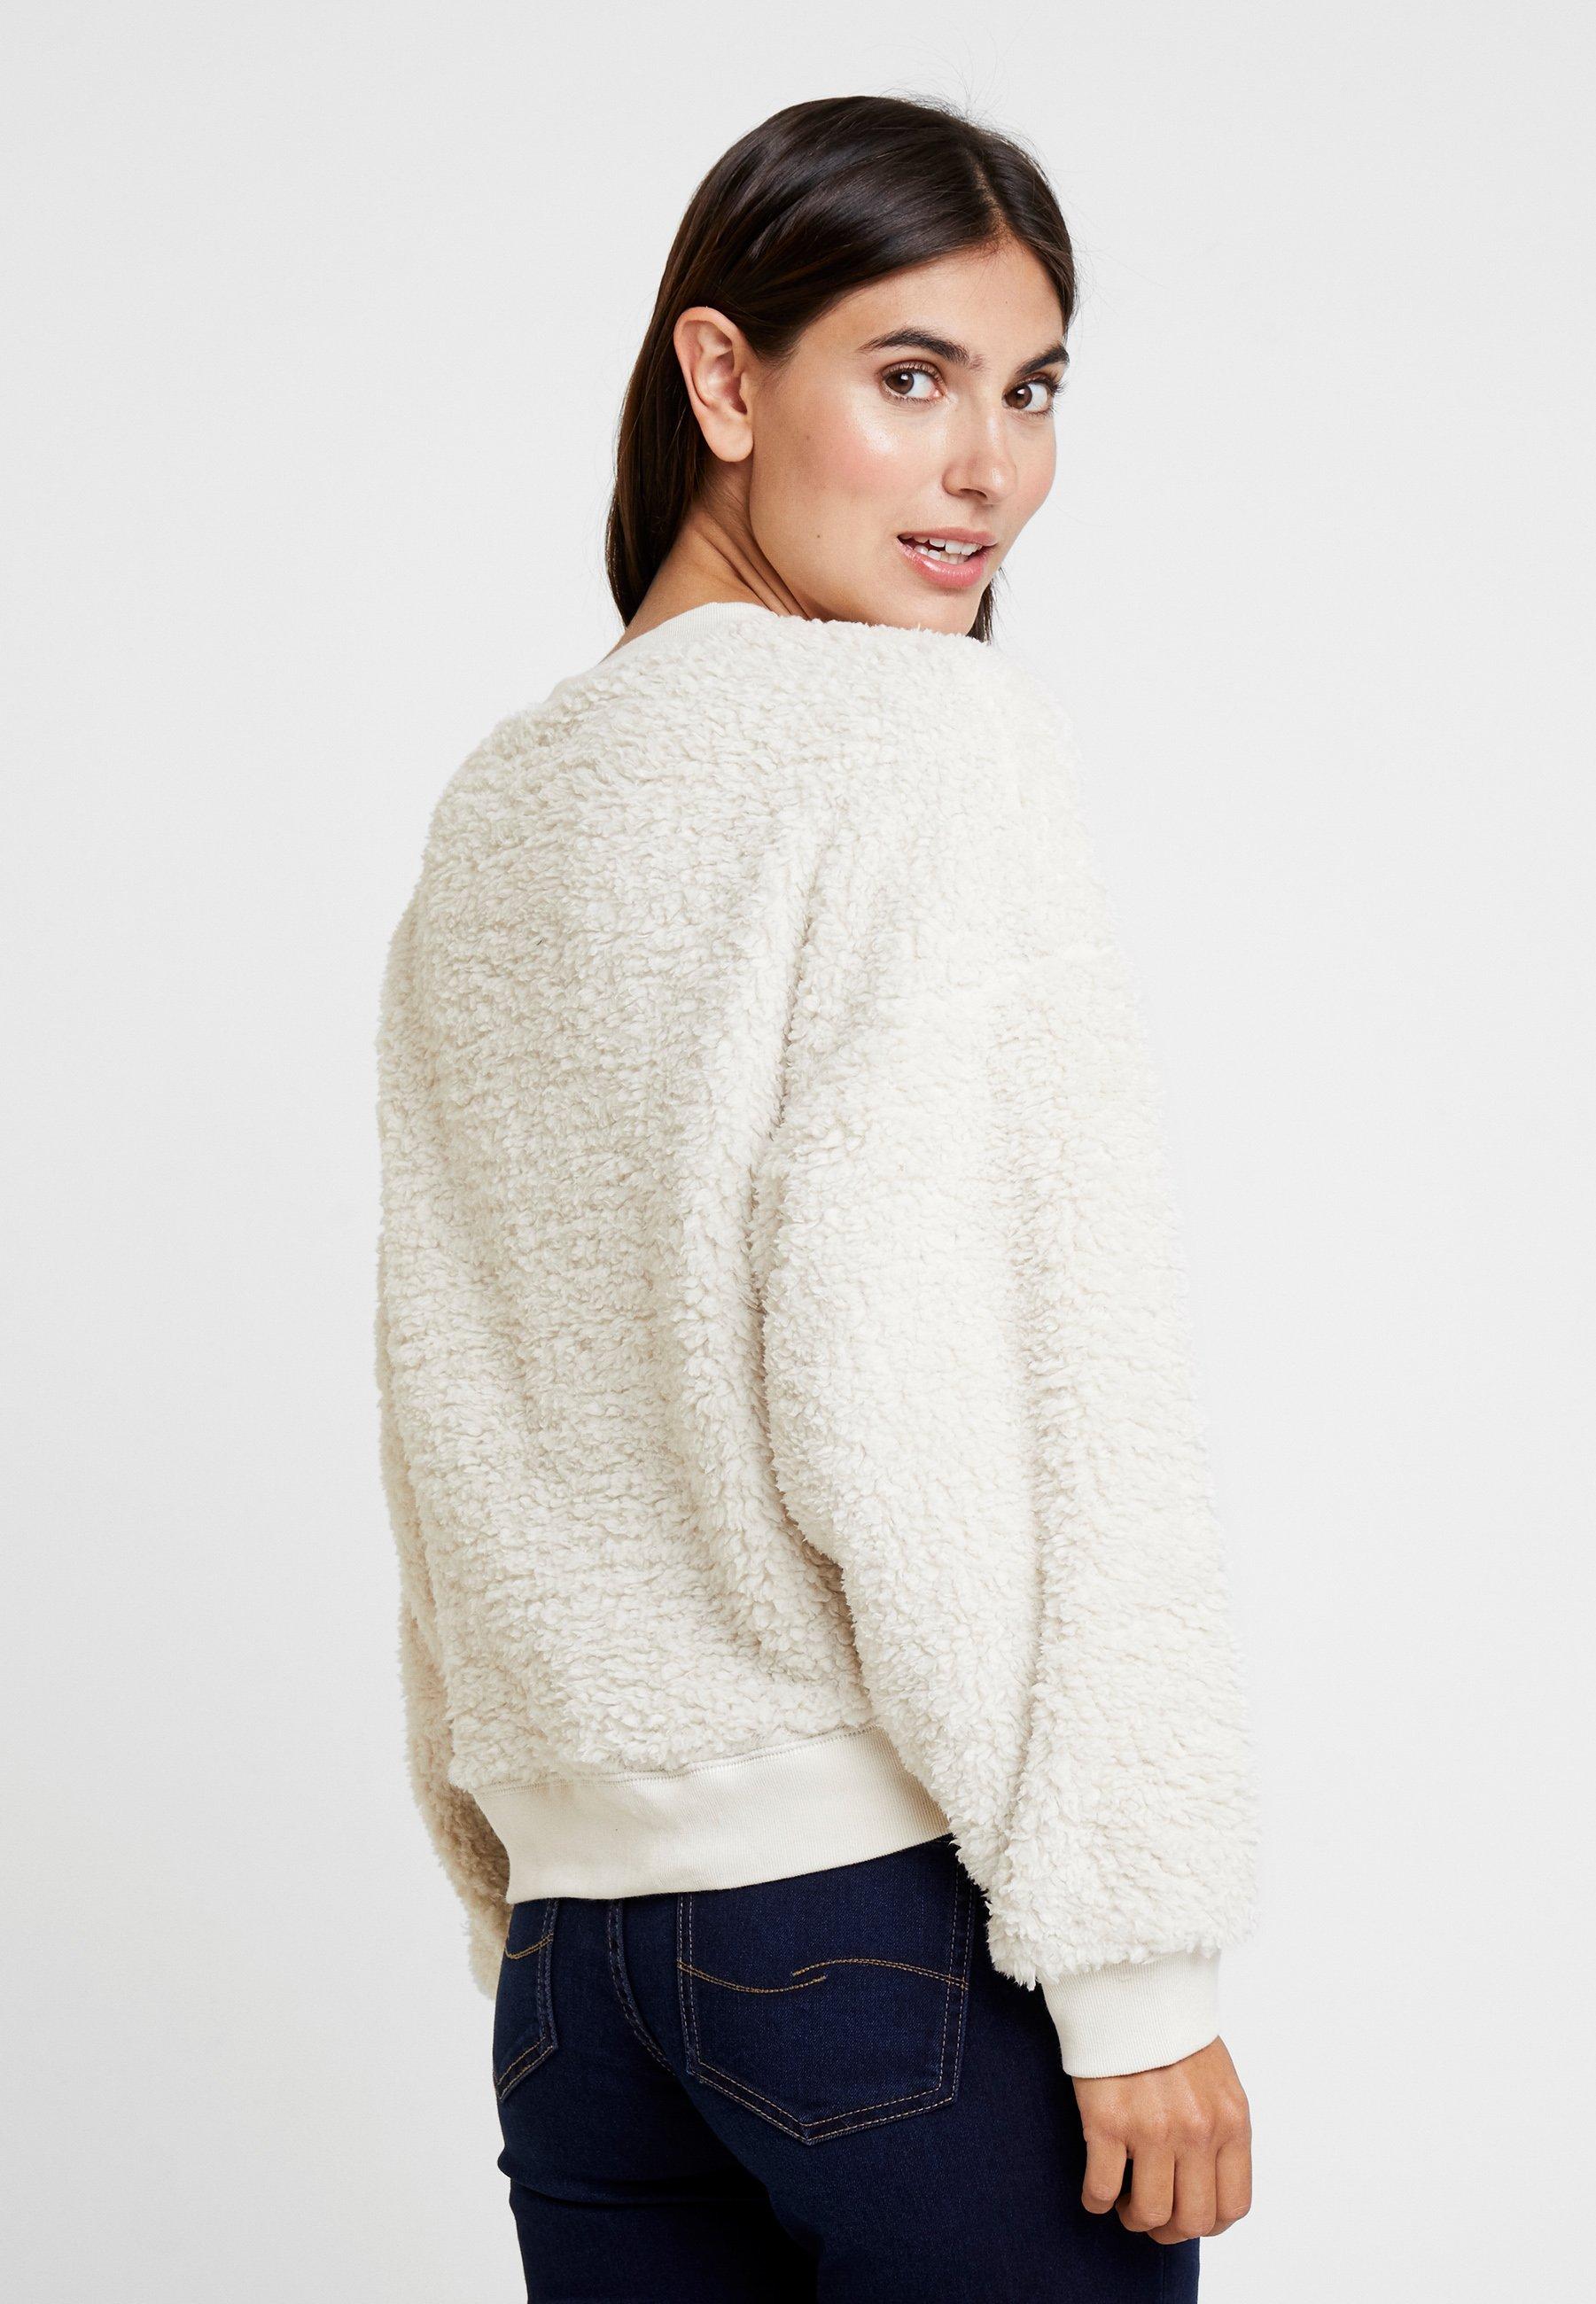 Gap Soft Gap Ivory Soft SherpaSweatshirt SherpaSweatshirt Ivory ygb76f